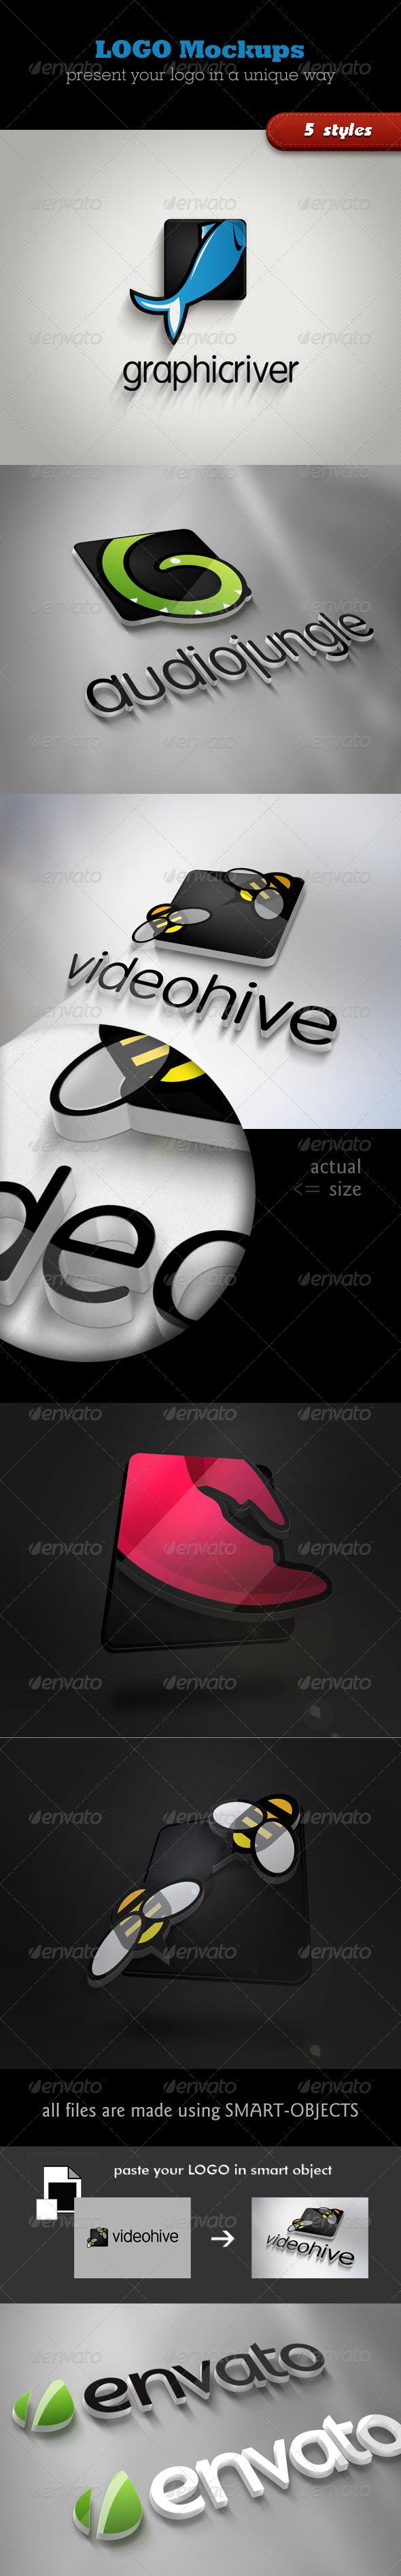 Graphicriver | 3D Logo Mockups Free Download free download Graphicriver | 3D Logo Mockups Free Download nulled Graphicriver | 3D Logo Mockups Free Download